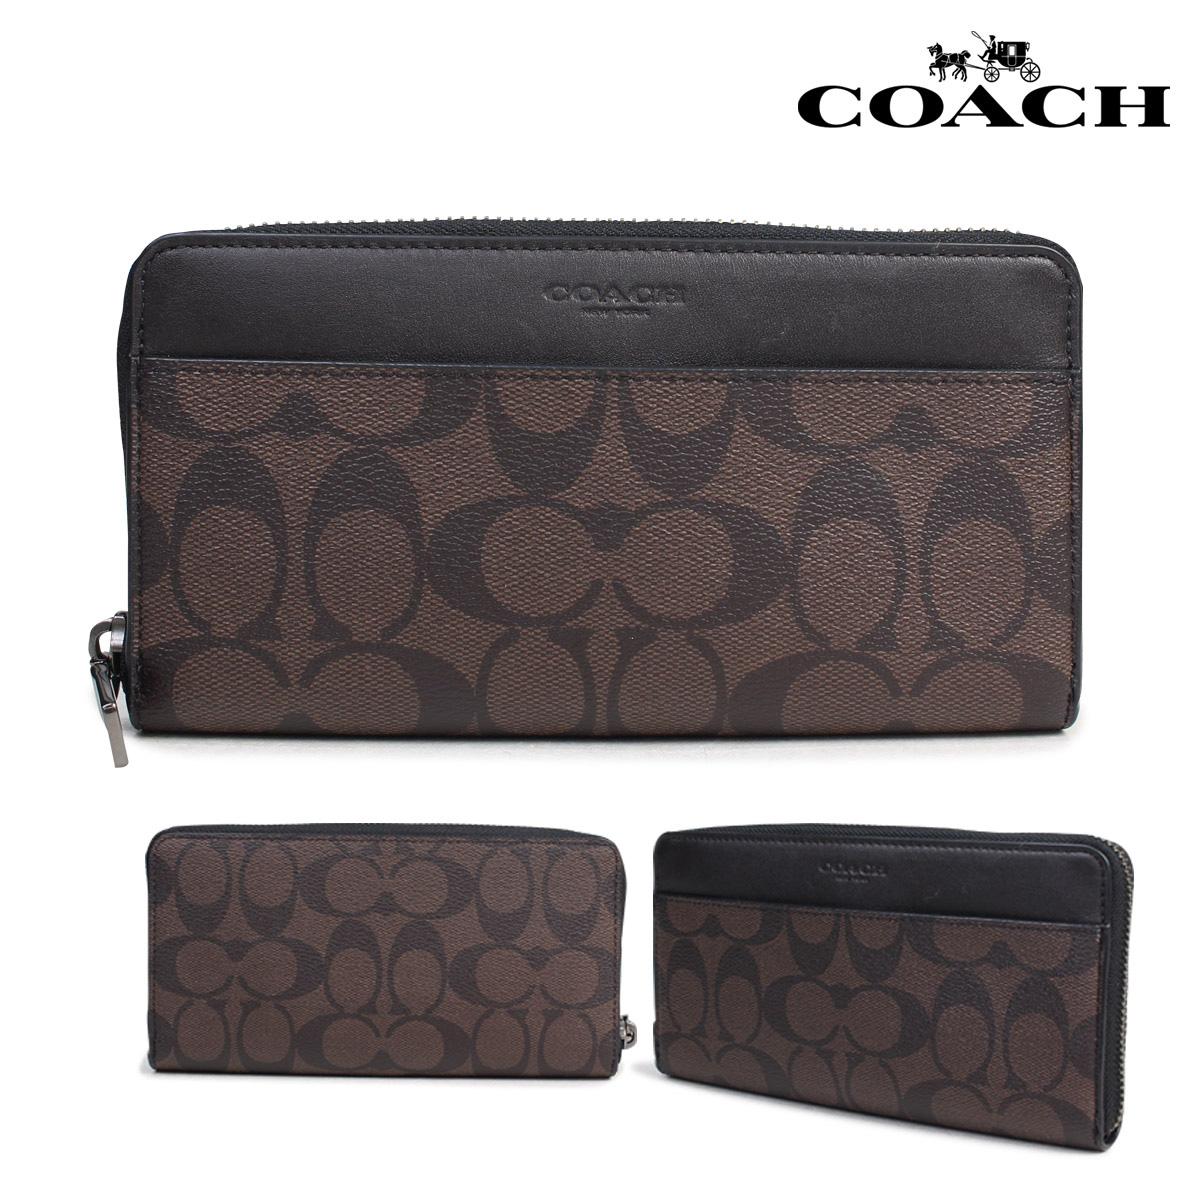 4ed214ec49 COACH coach wallet men long wallet round fastener signature F58112 brown